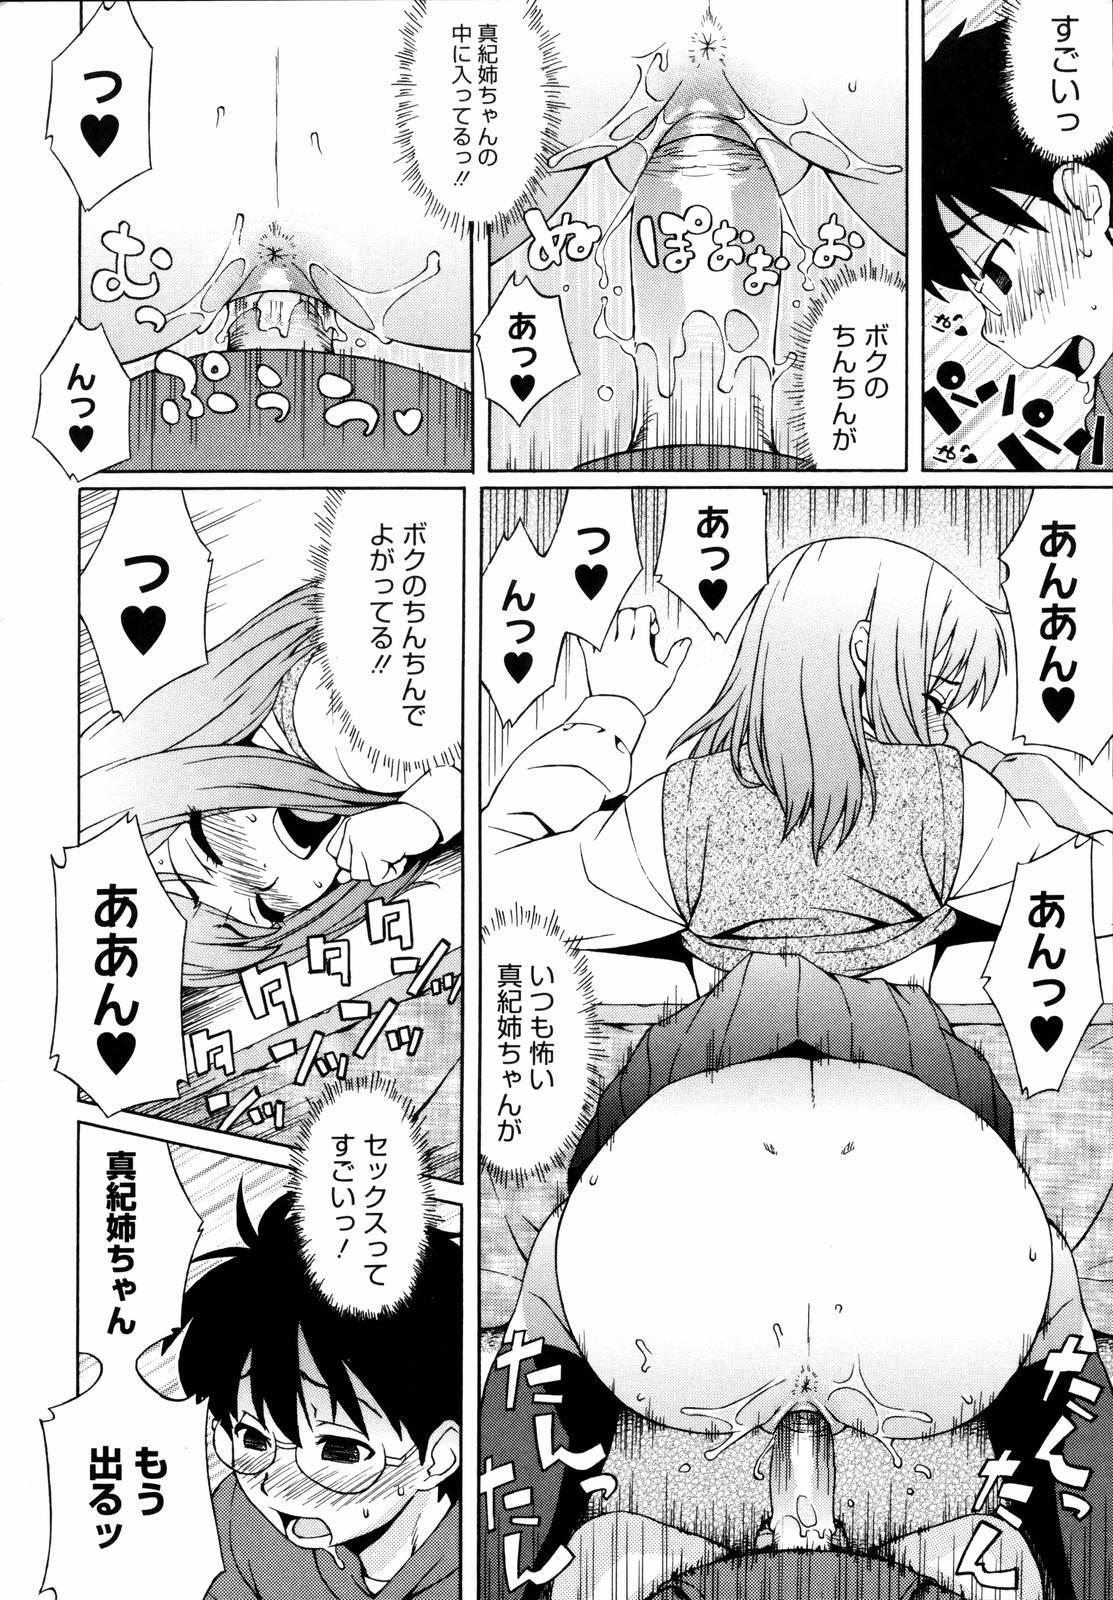 Shishunki wa Hatsujouki - Adolescence is a sexual excitement period. 163